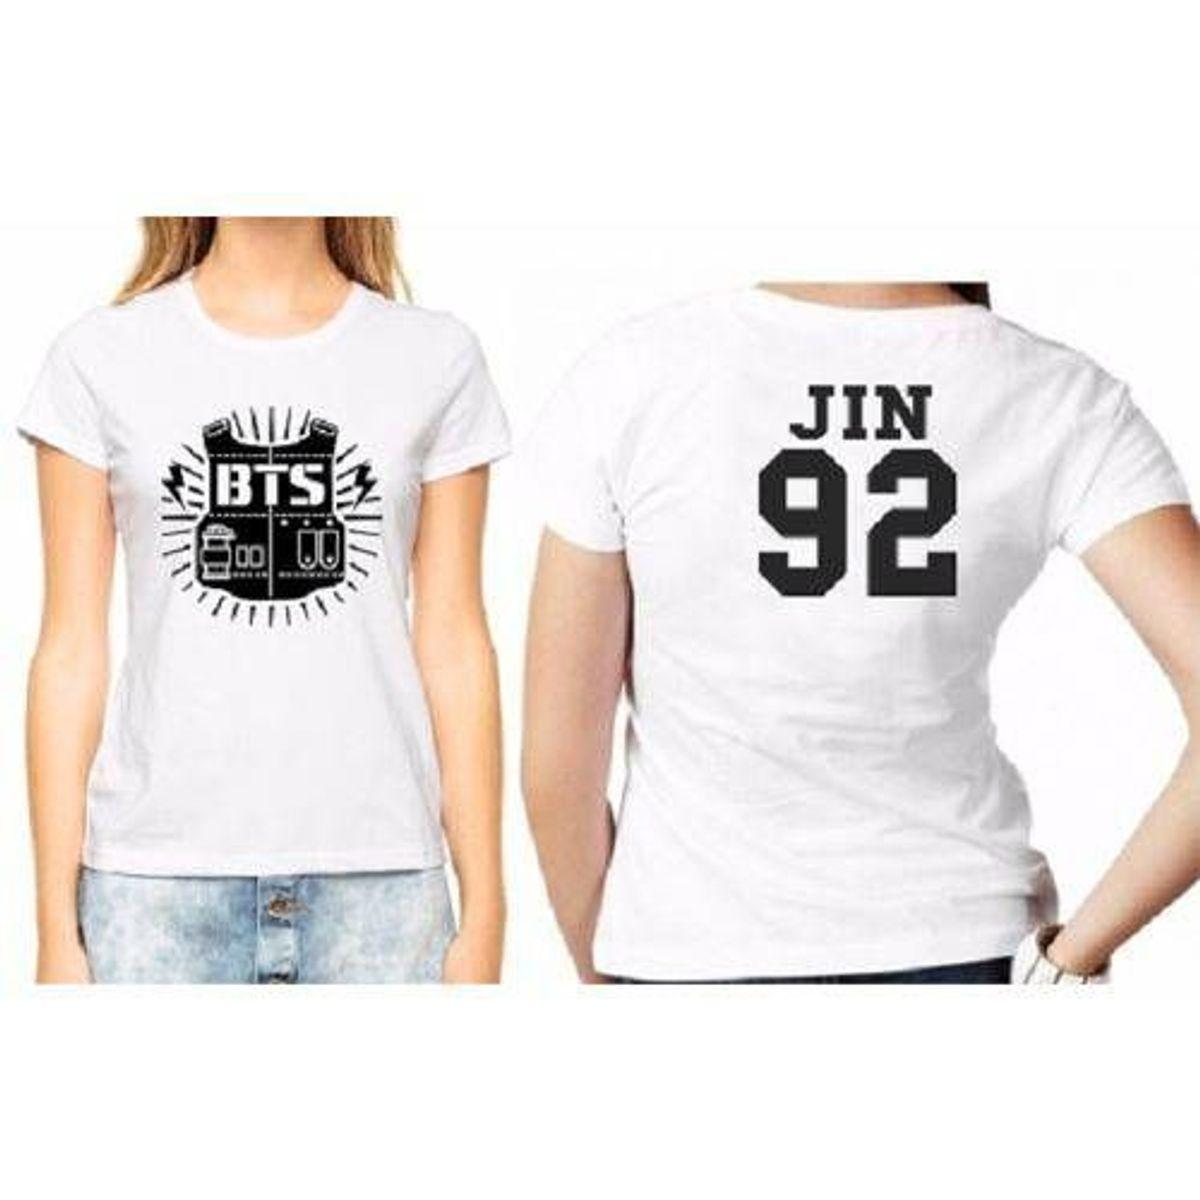 camiseta bts babylook bts banda coreana todos os tamanhos - camisetas bts